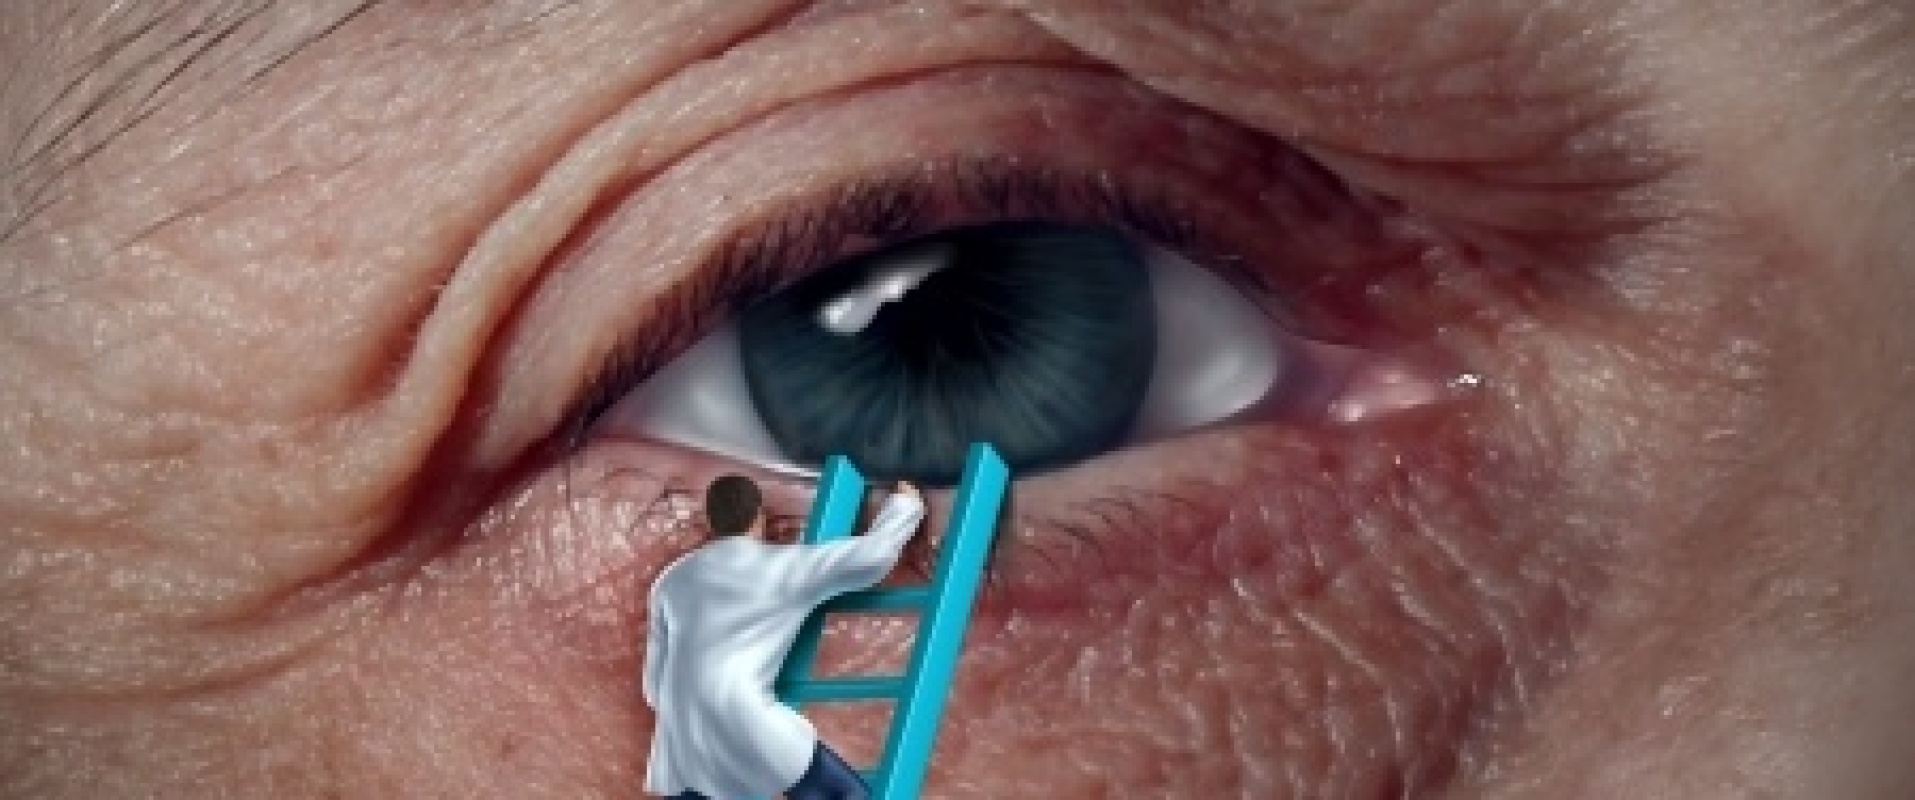 Lensimplantaten, brrr!!